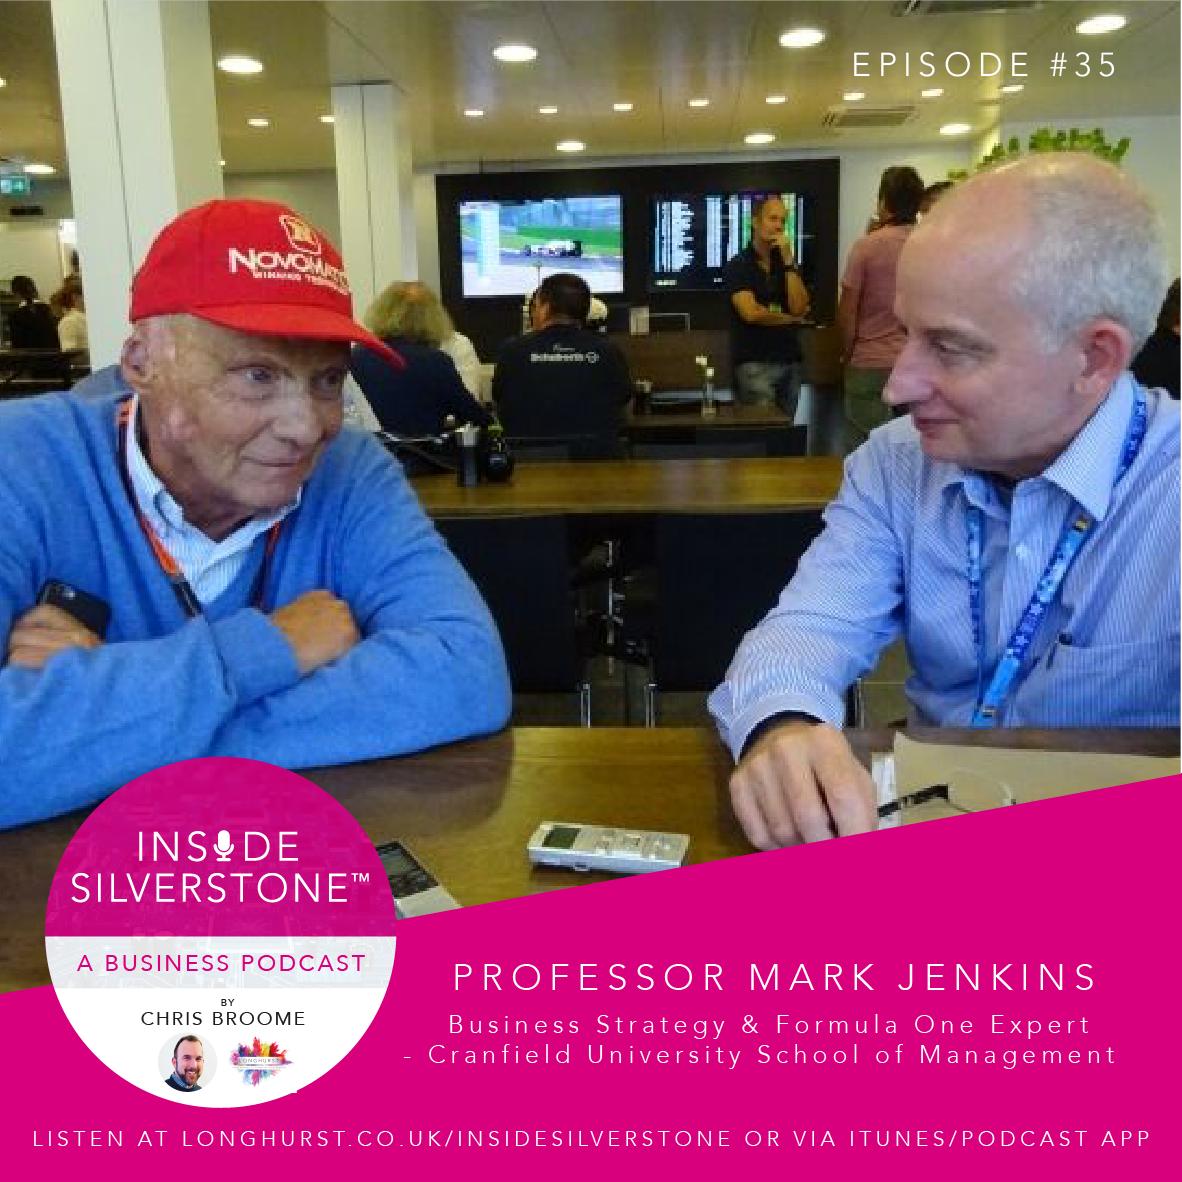 Professor Mark Jenkins - Business Strategy & Formula One Expert - Cranfield University School of Management